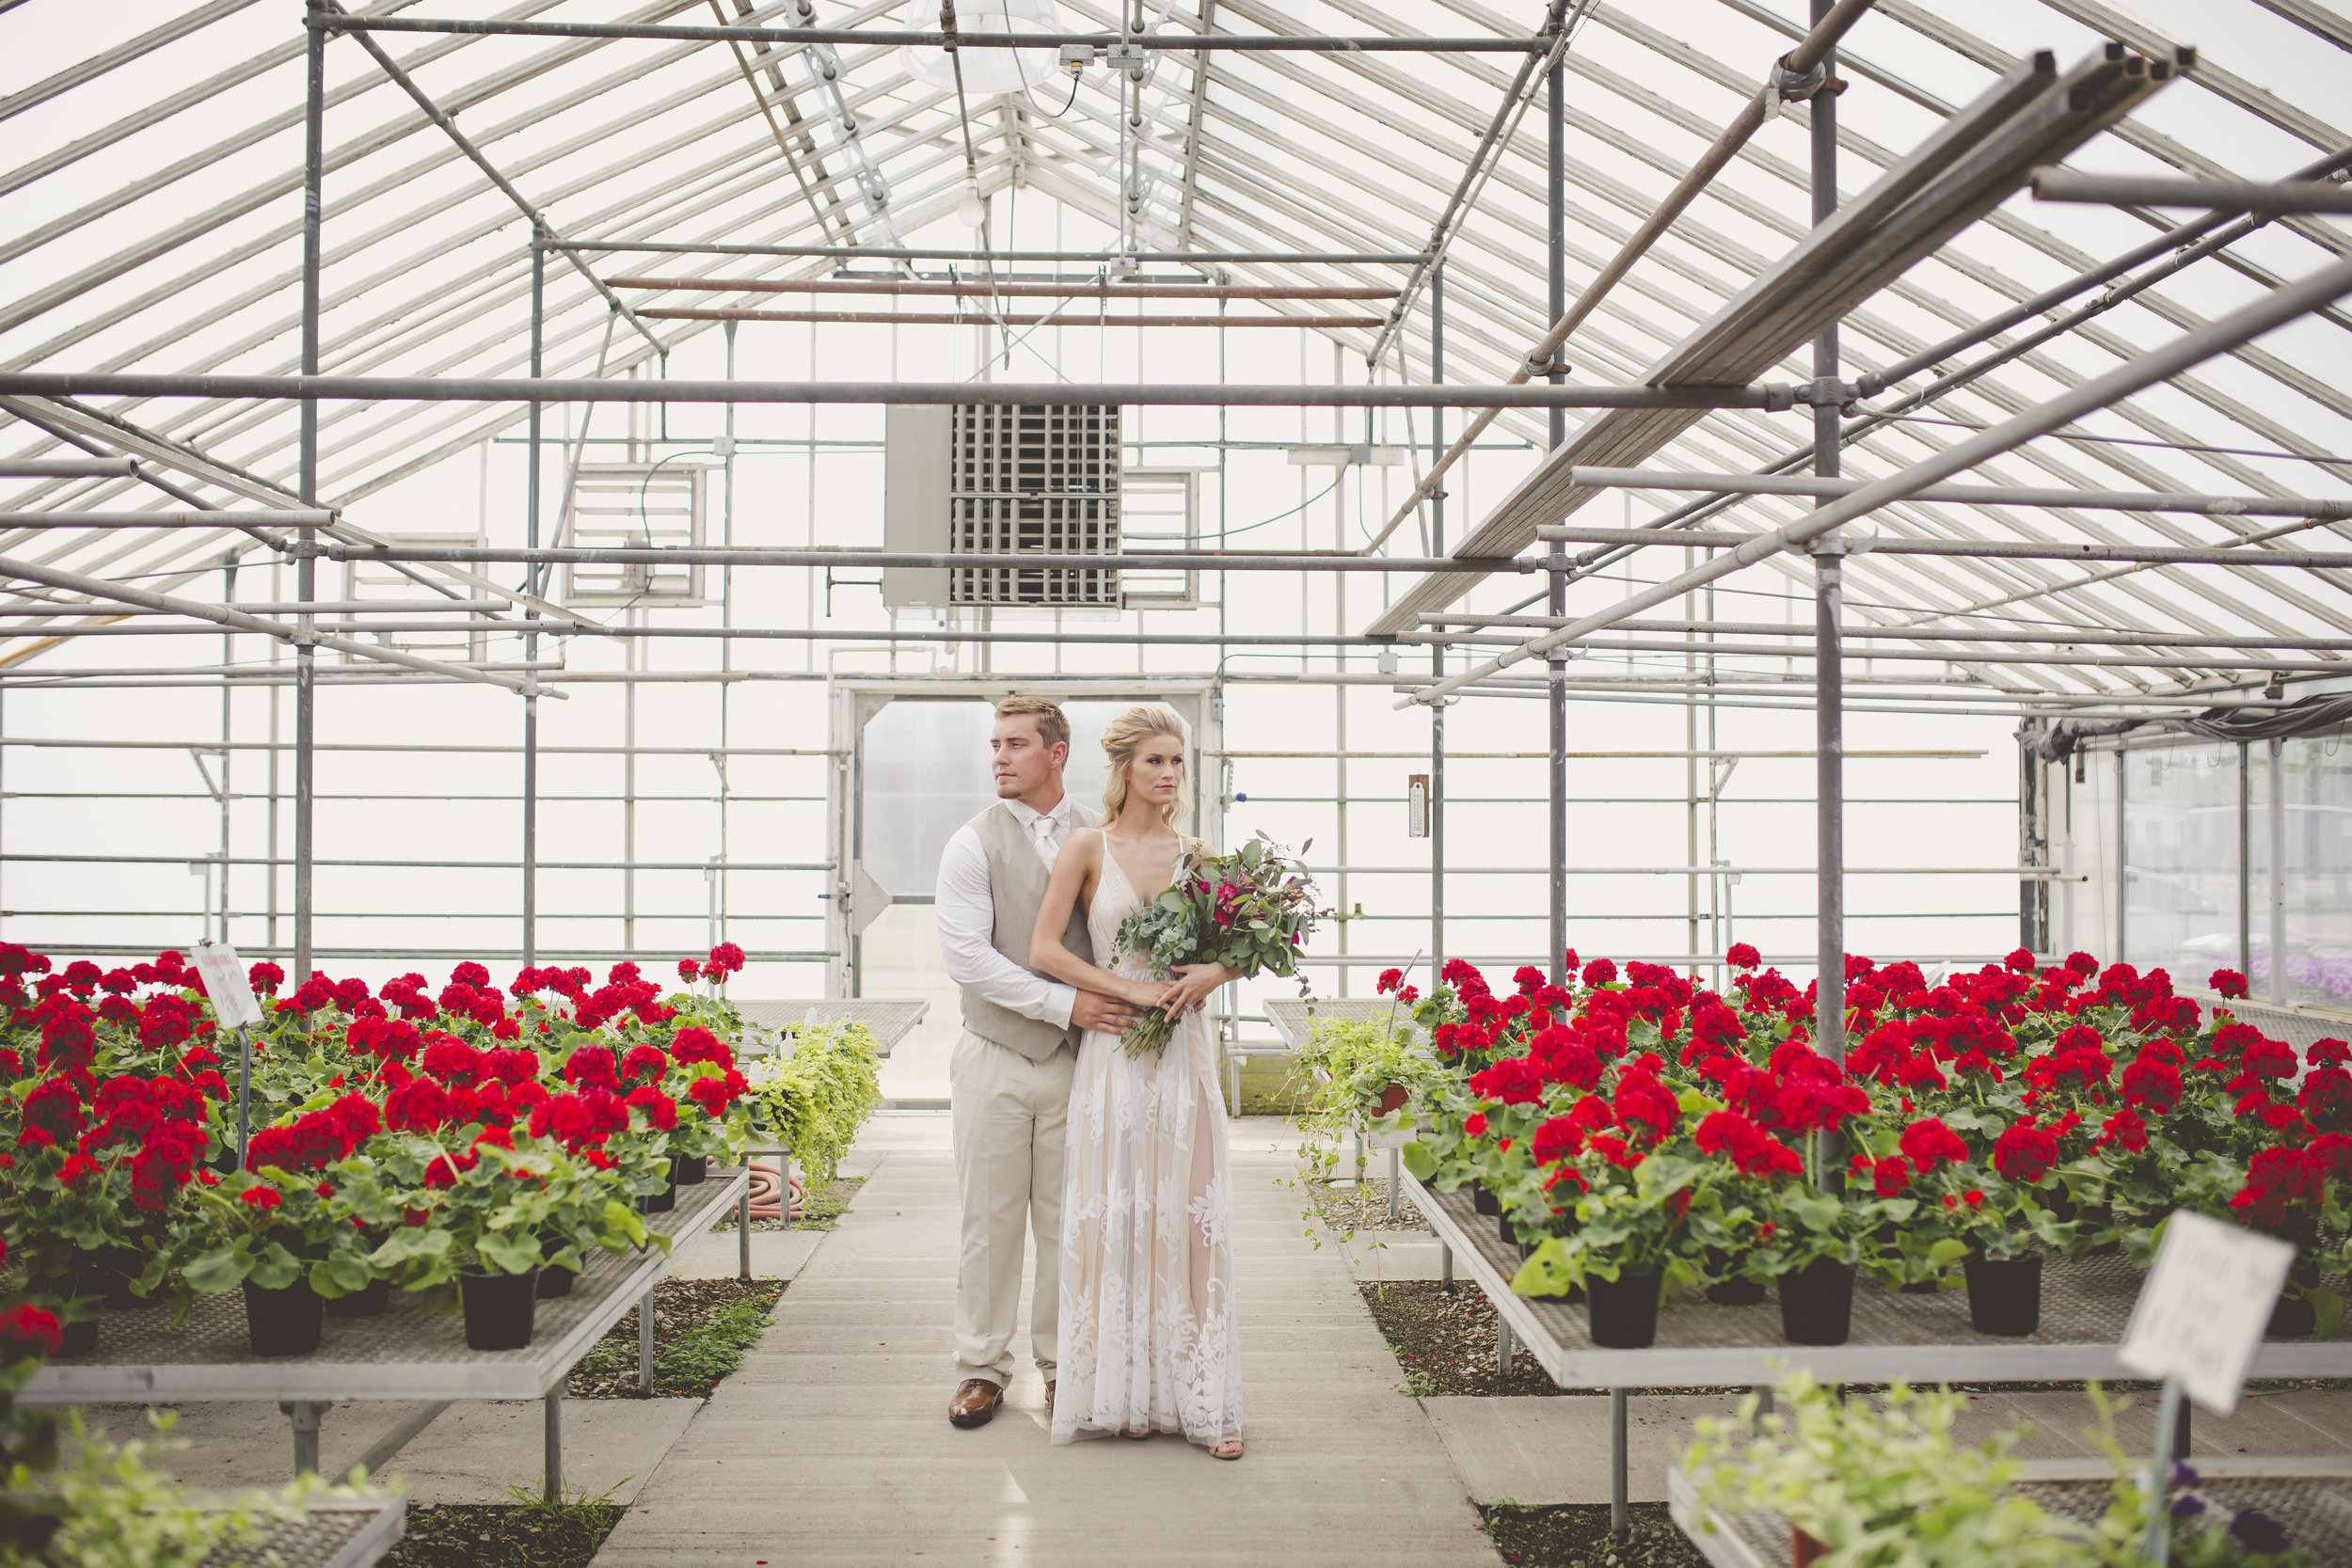 Modern Greenhouse Romance for Destination Wisconsin Wedding Blog